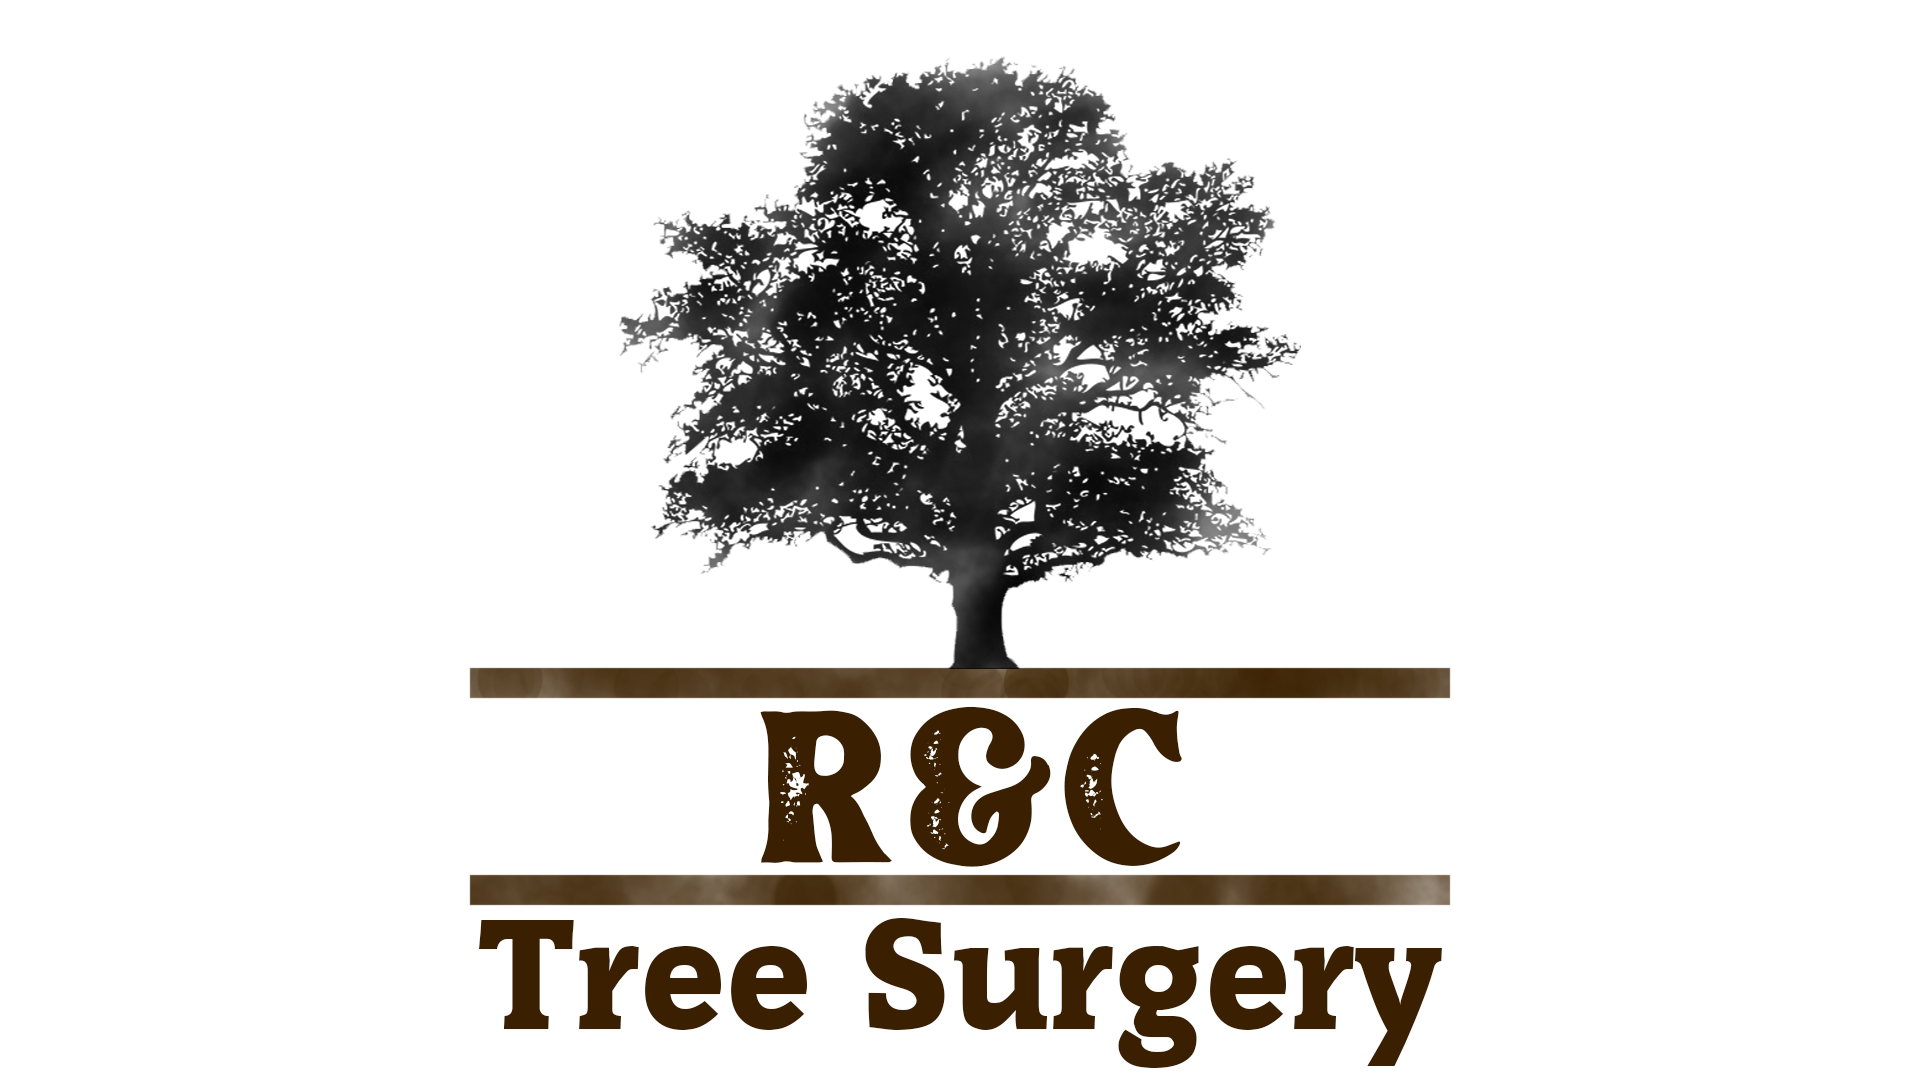 R&C Tree Surgery logo